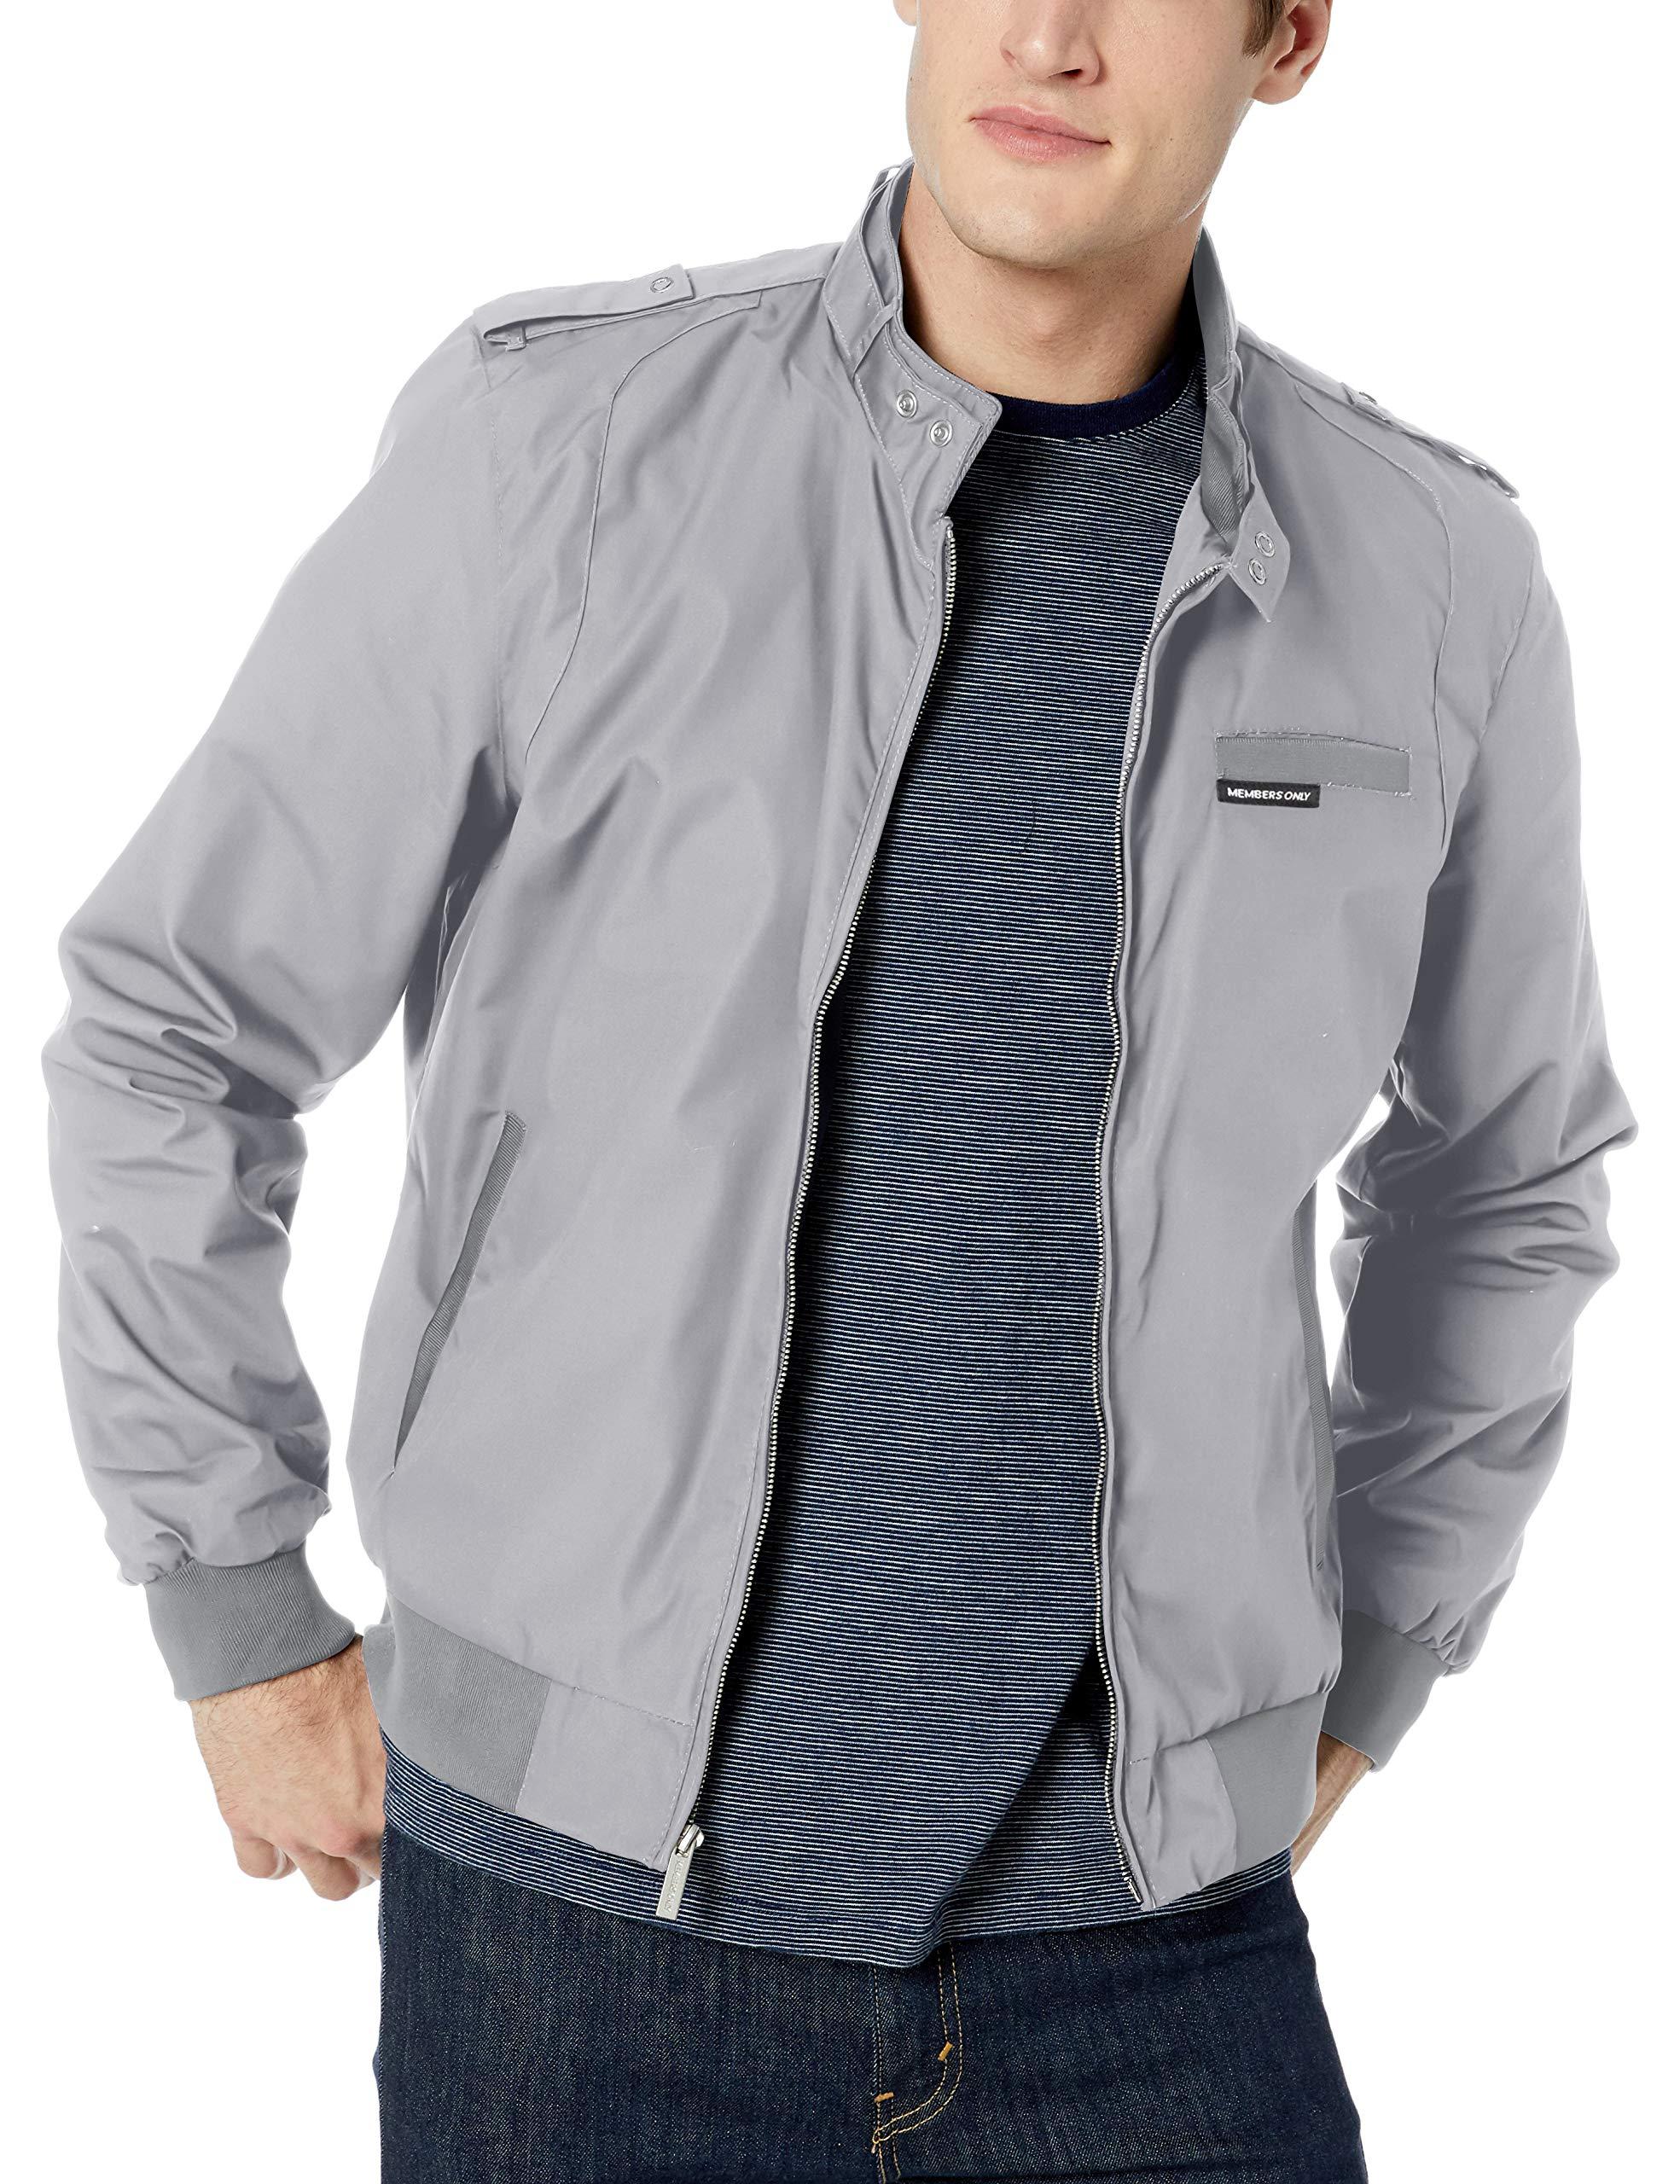 Members Only Men's Original Iconic Racer Jacket, Grey, Medium